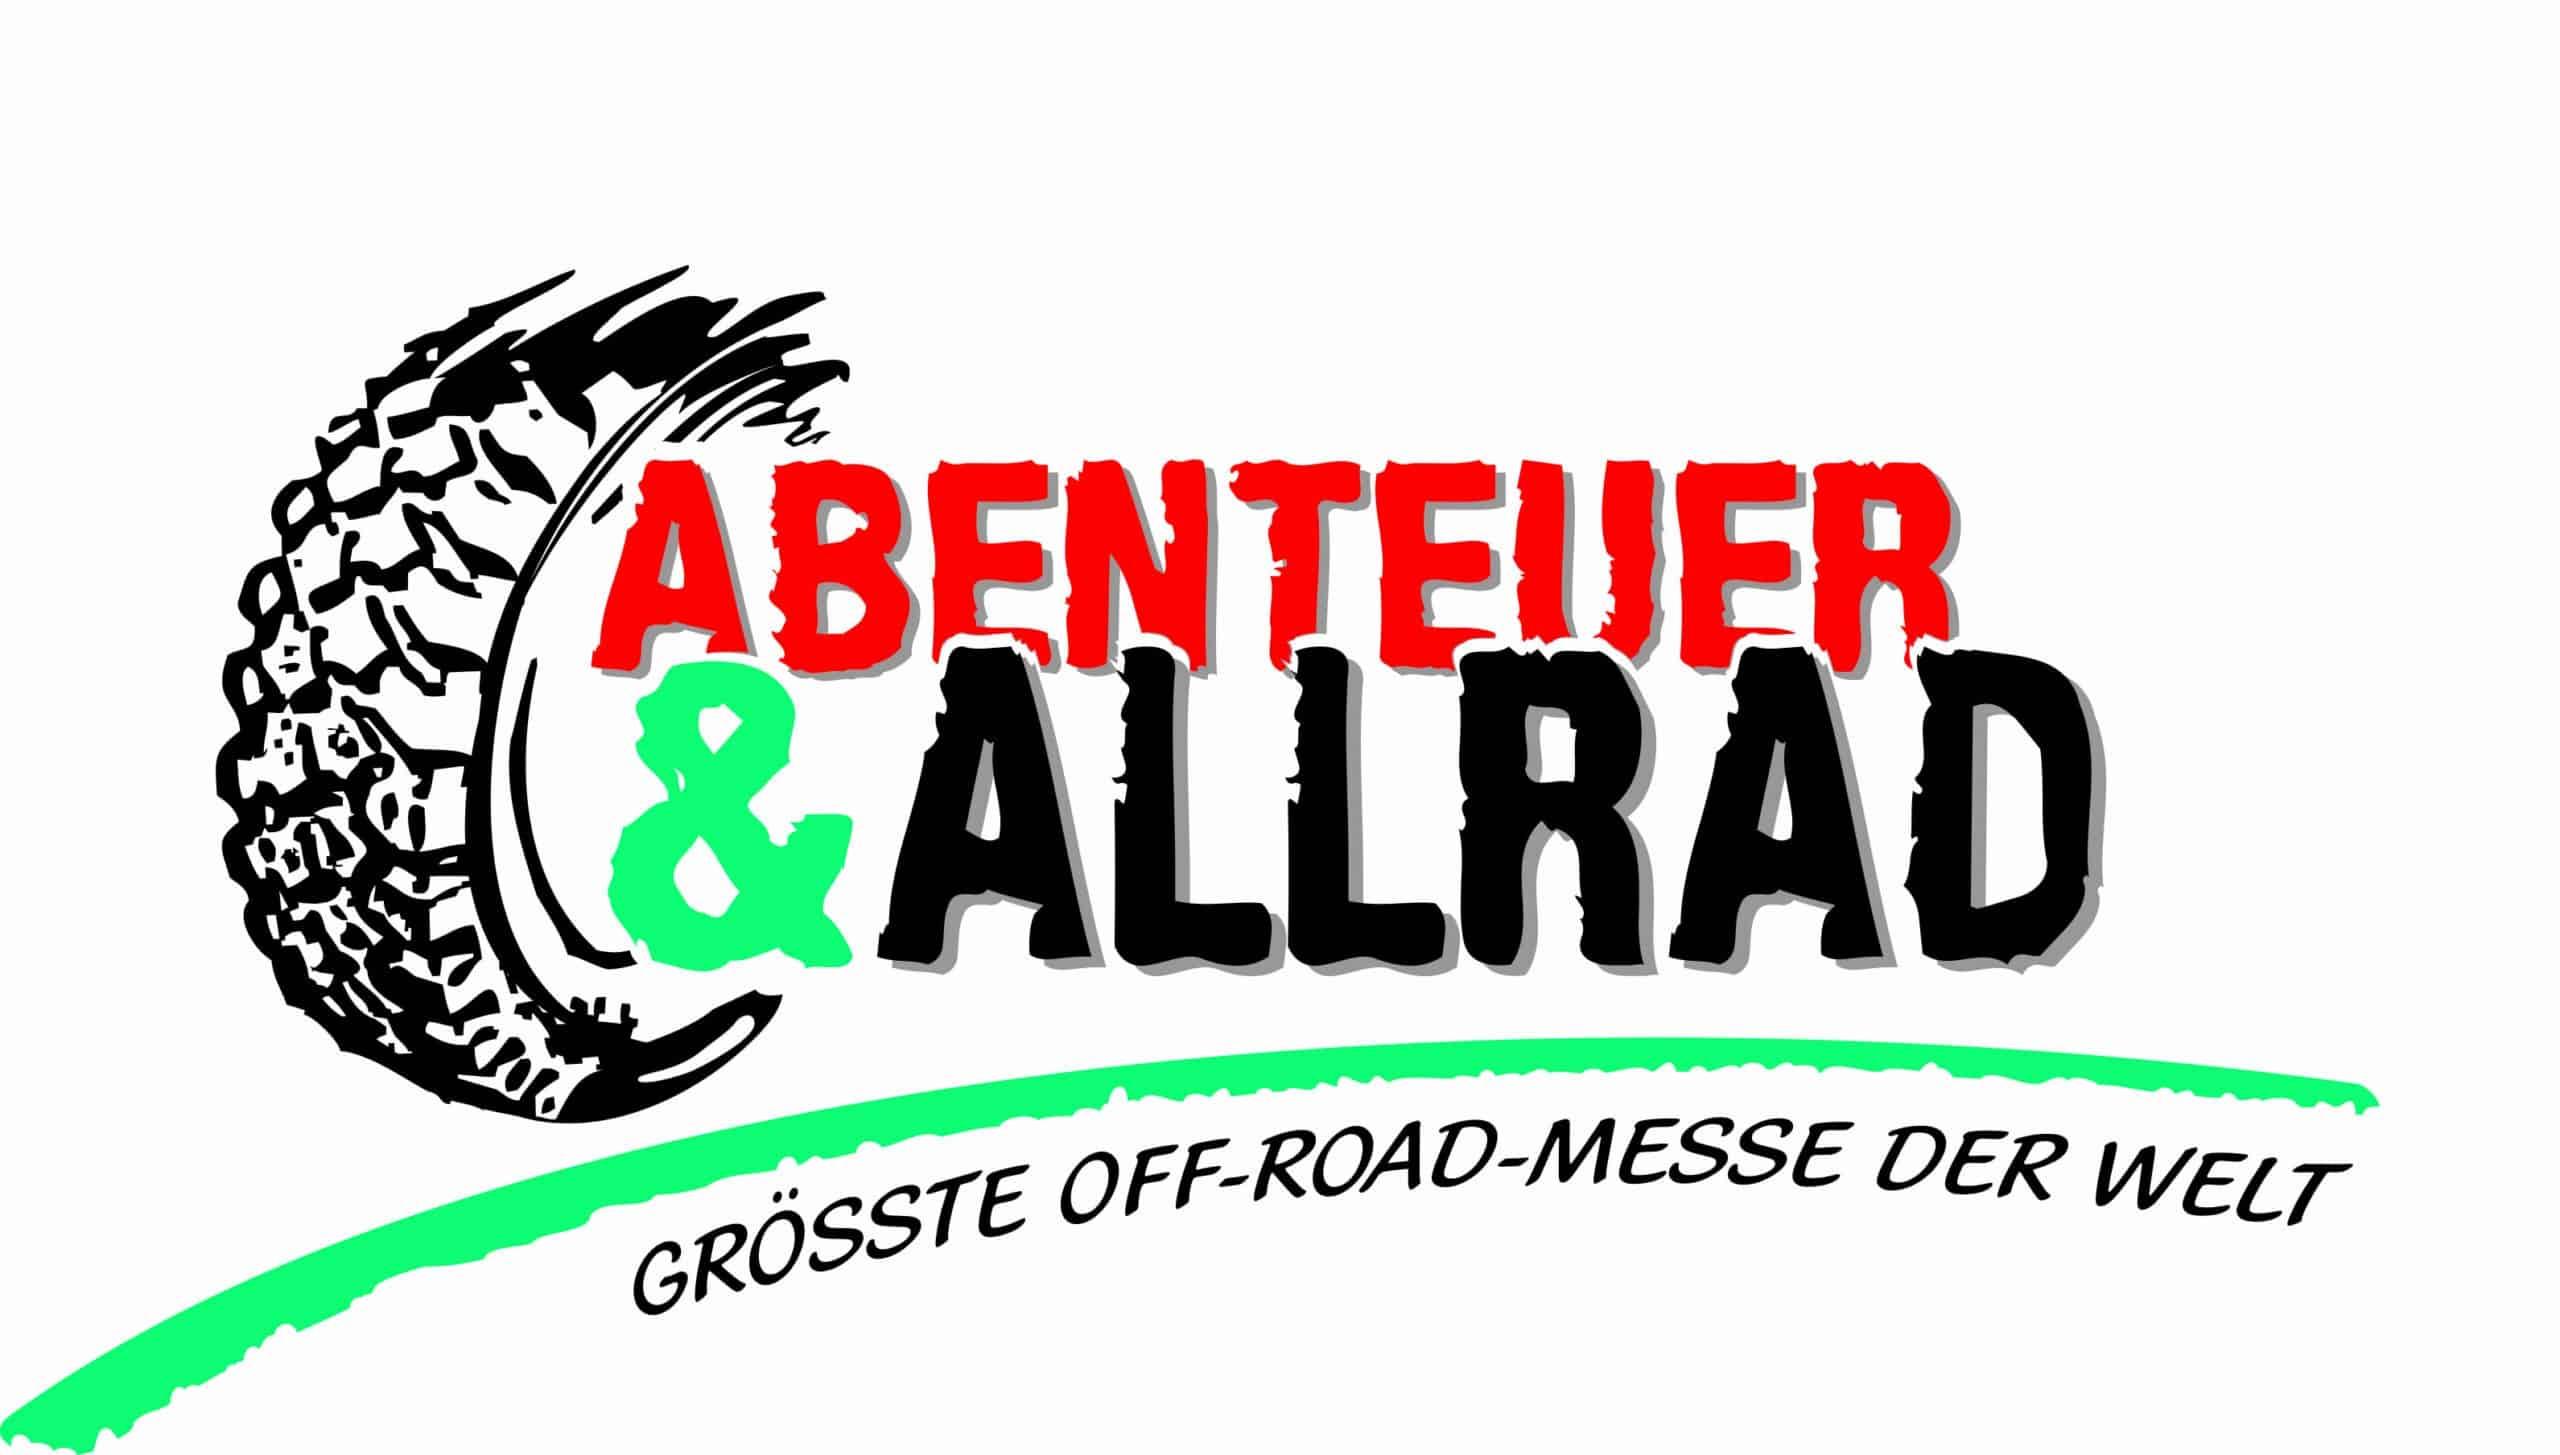 Abenteuer & Allrad